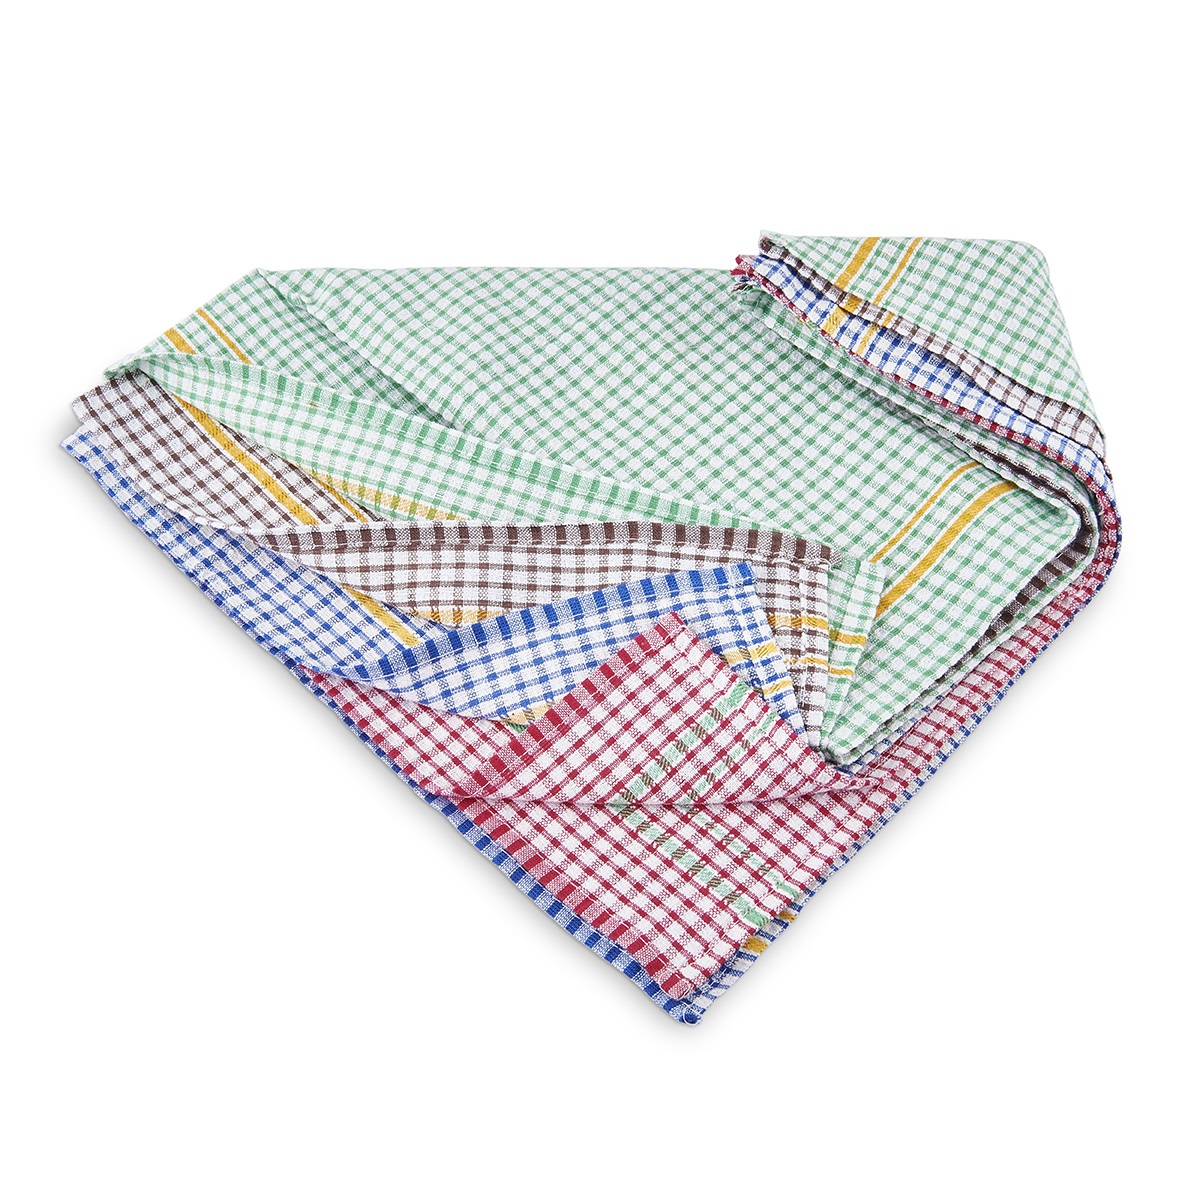 AT410_tea_towel_dobby_weave_budget